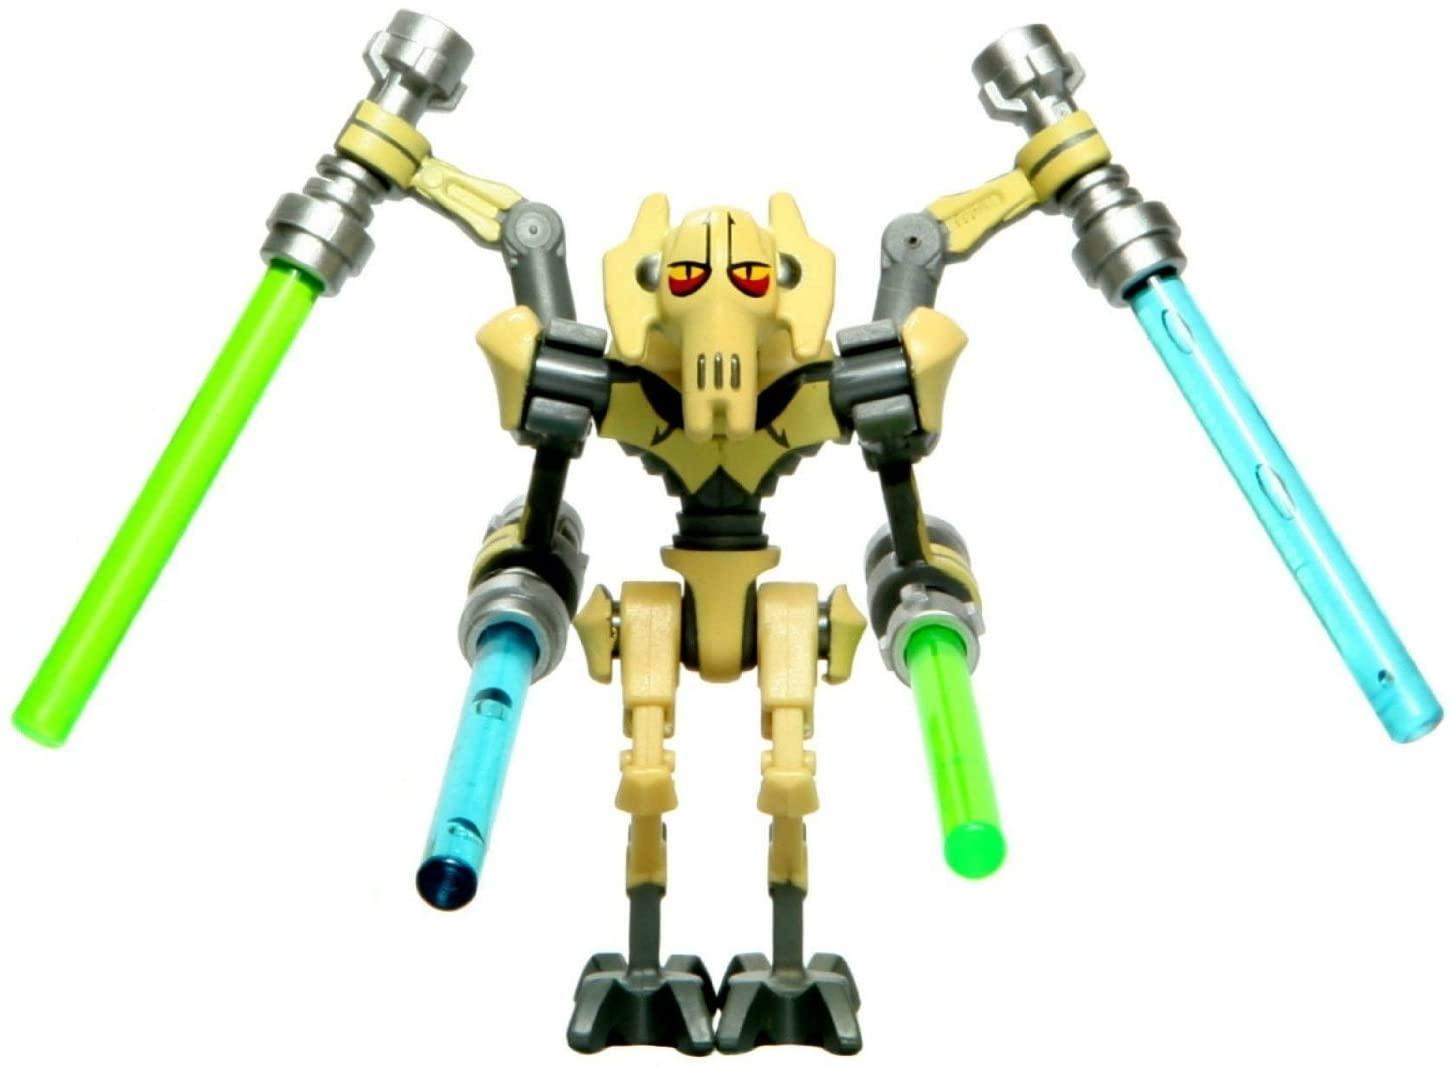 LEGO General Grievous: - Star Wars